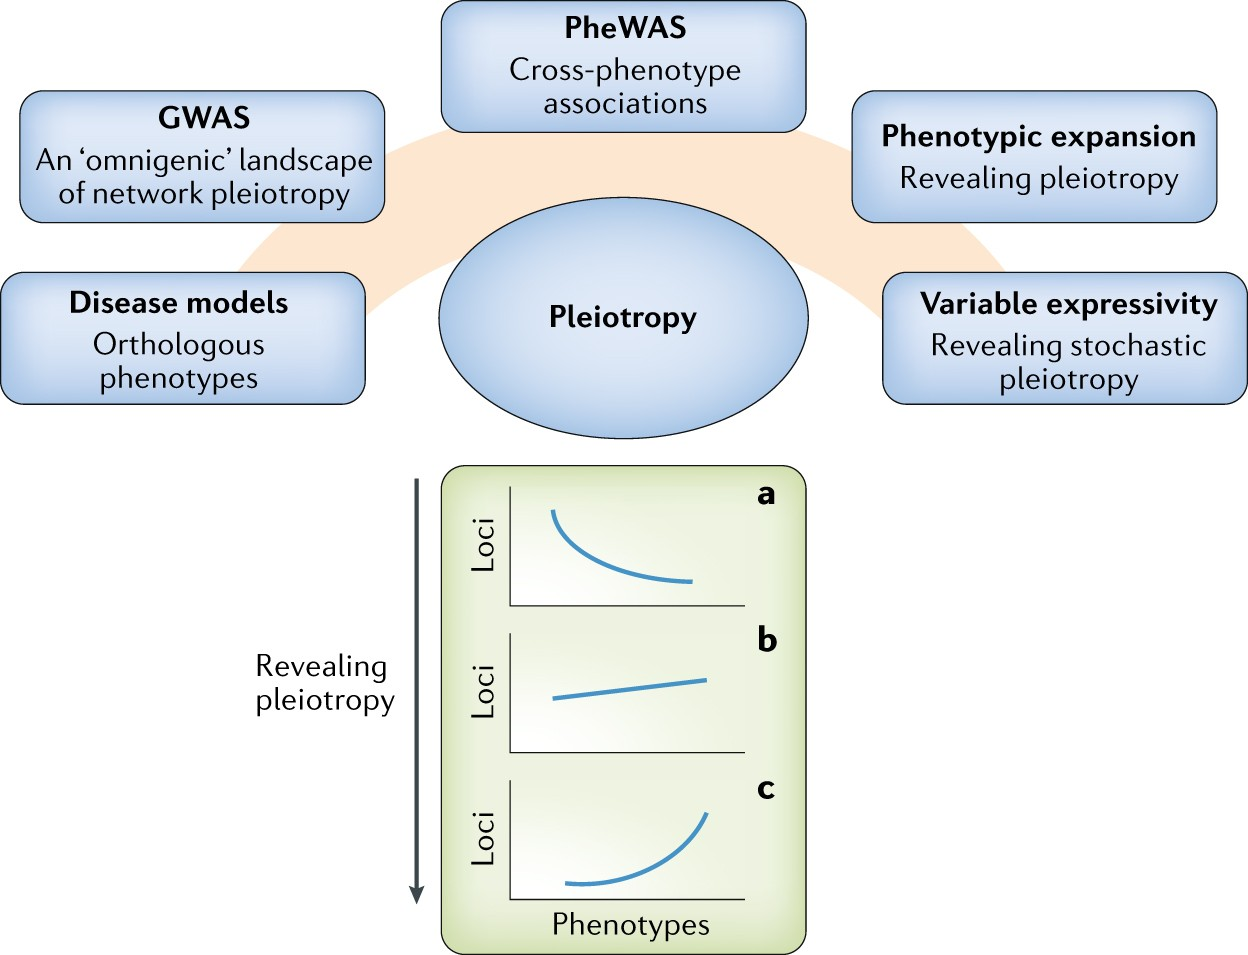 41576_2018_5_Fig1_HTML high throughput mouse phenomics for characterizing mammalian gene